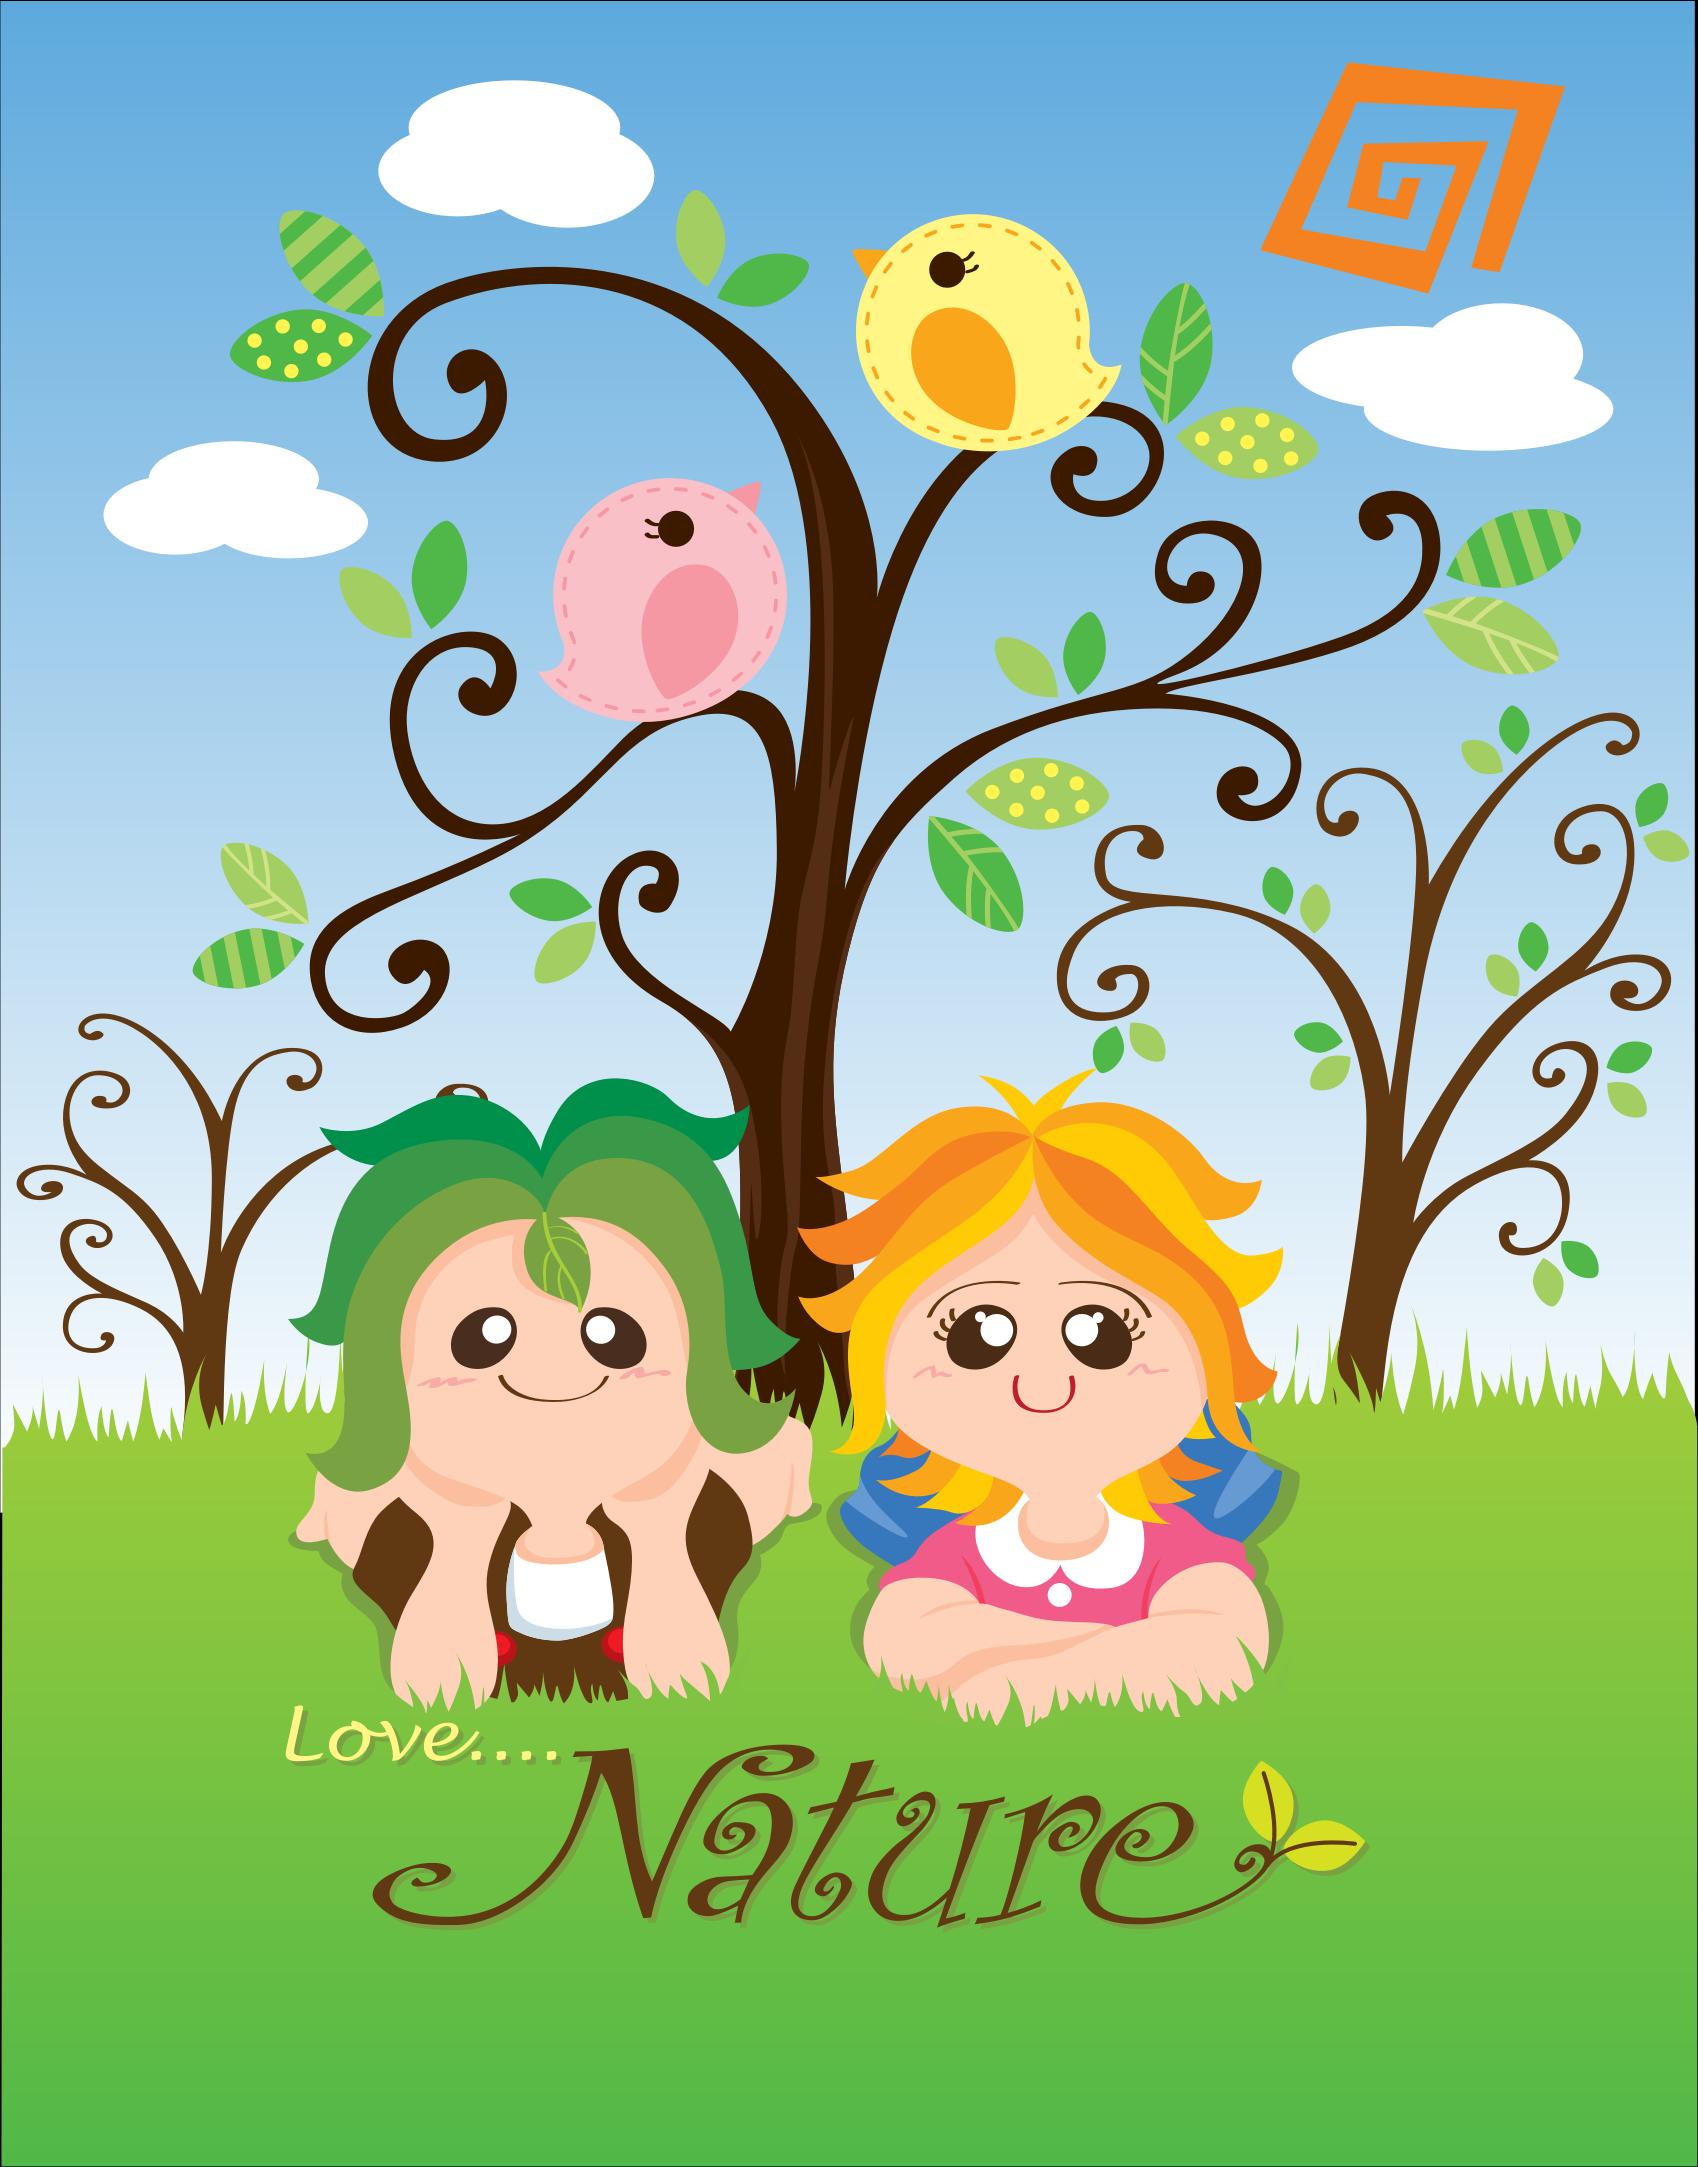 Nature Clipart For Kids | www.pixshark.com - Images ...